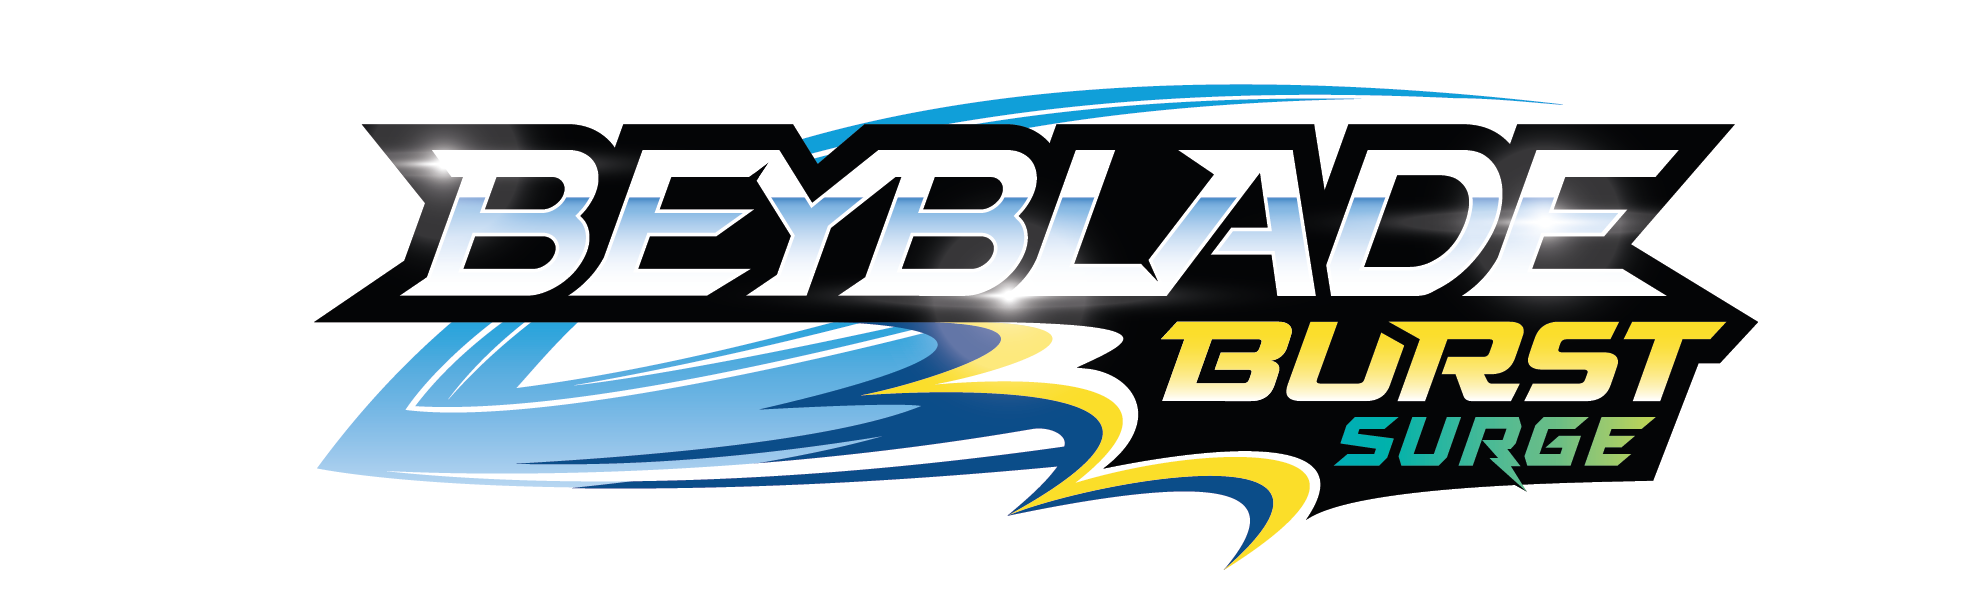 Beyblade Burst Rise logo